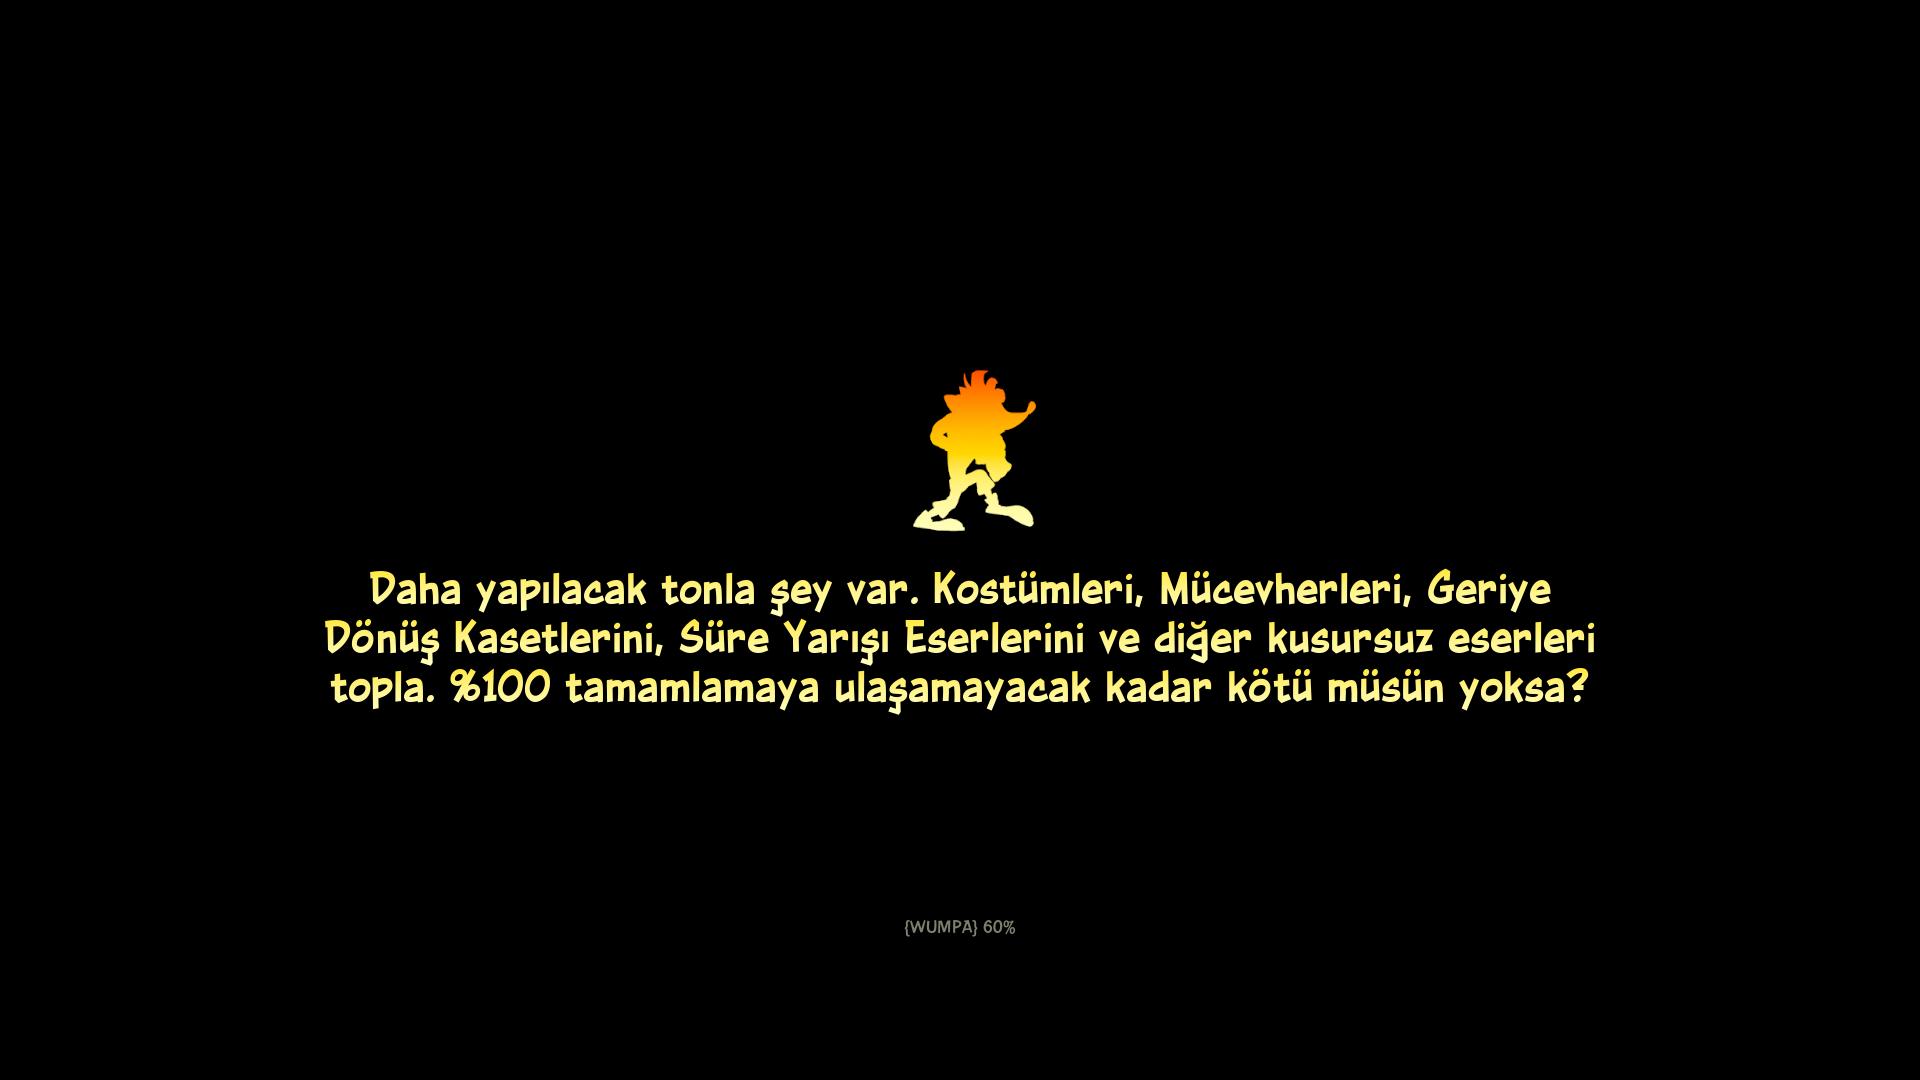 Mad Max Türkçe Yama